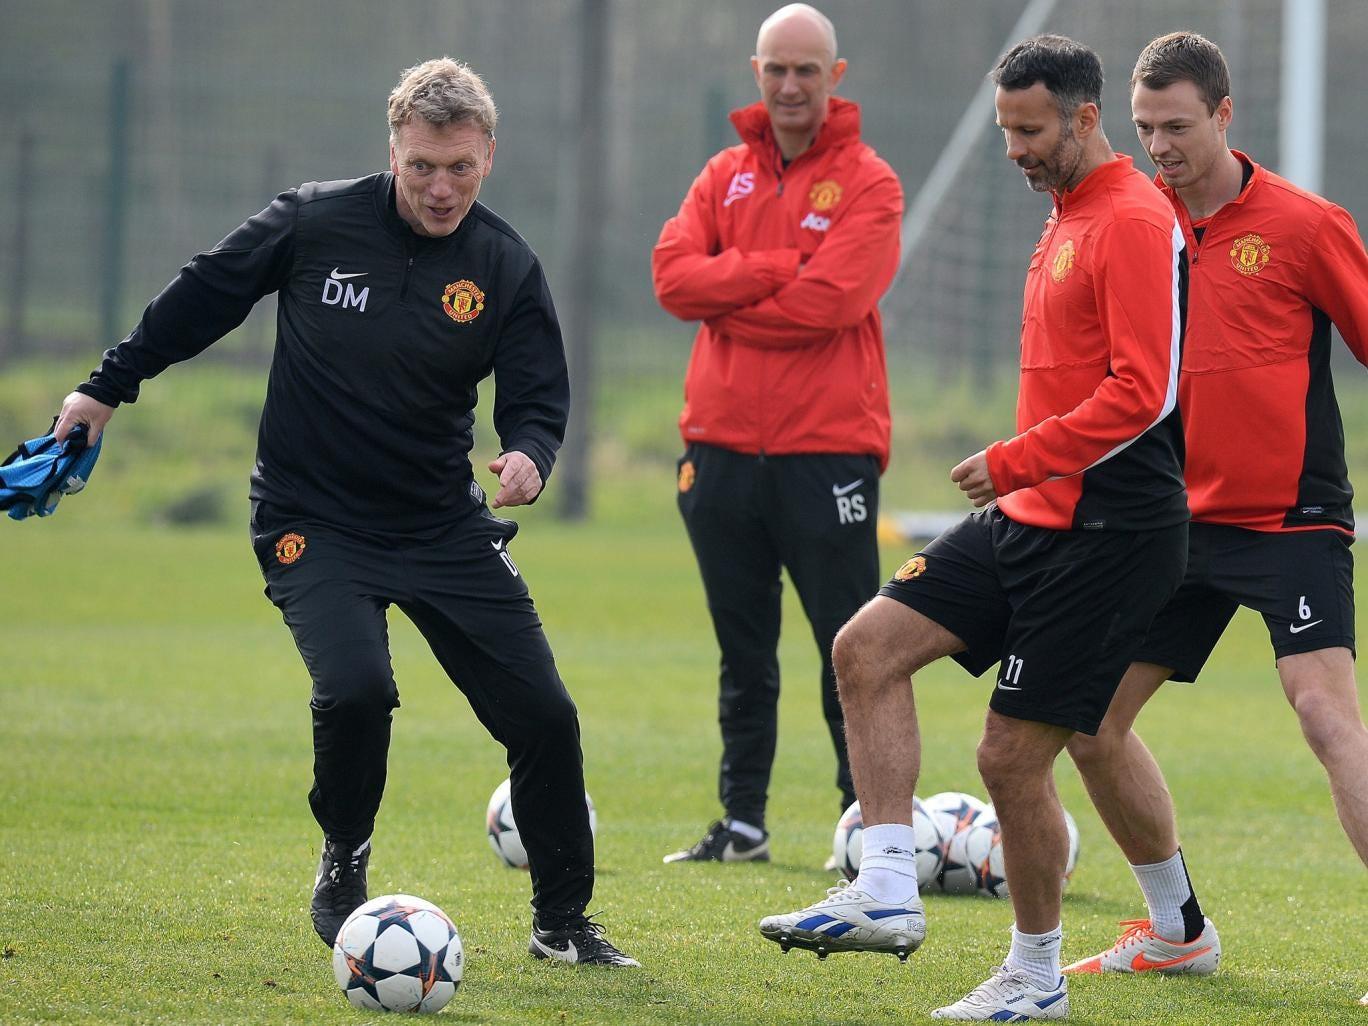 Manchester United manager David Moyes trains alongside Ryan Giggs